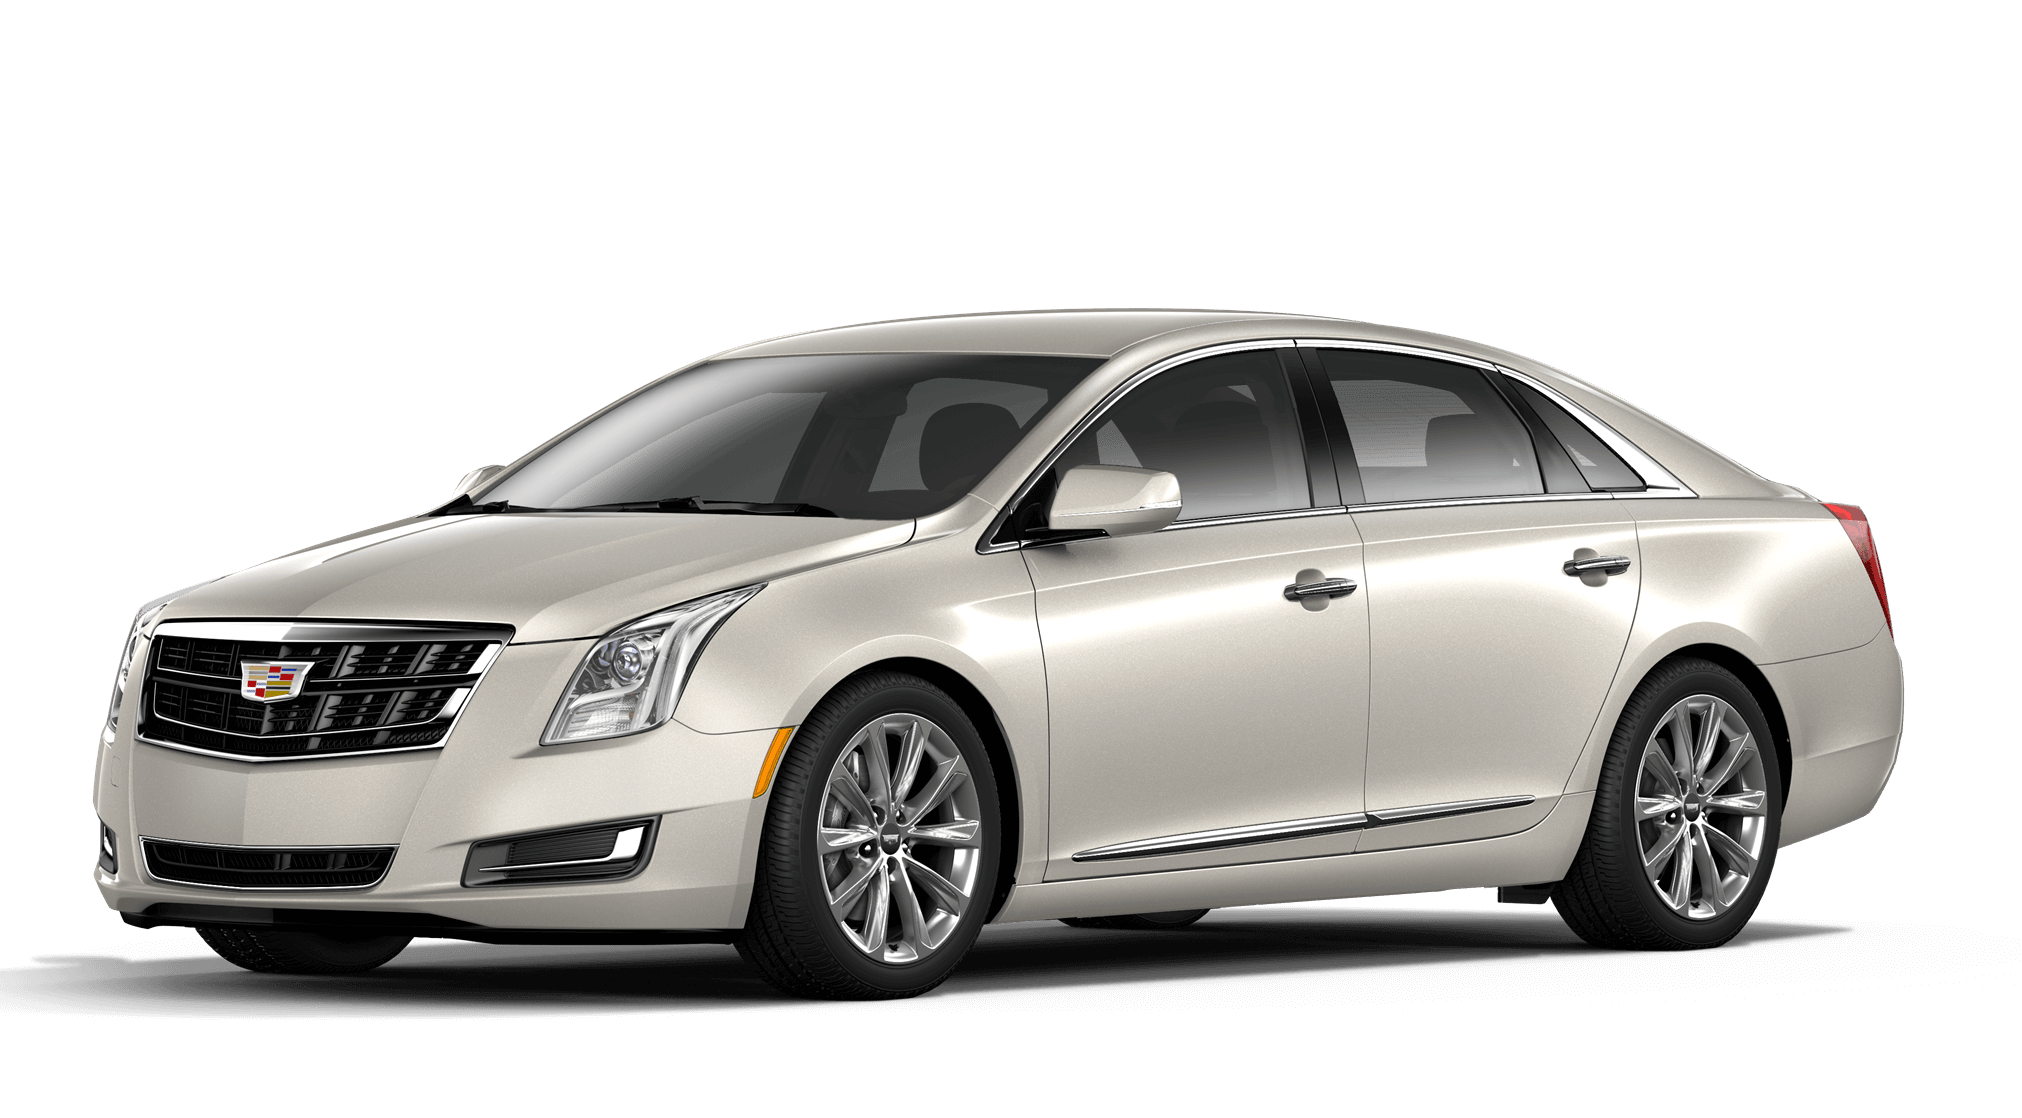 2016 Cadillac XTS Silver Coast Metallic